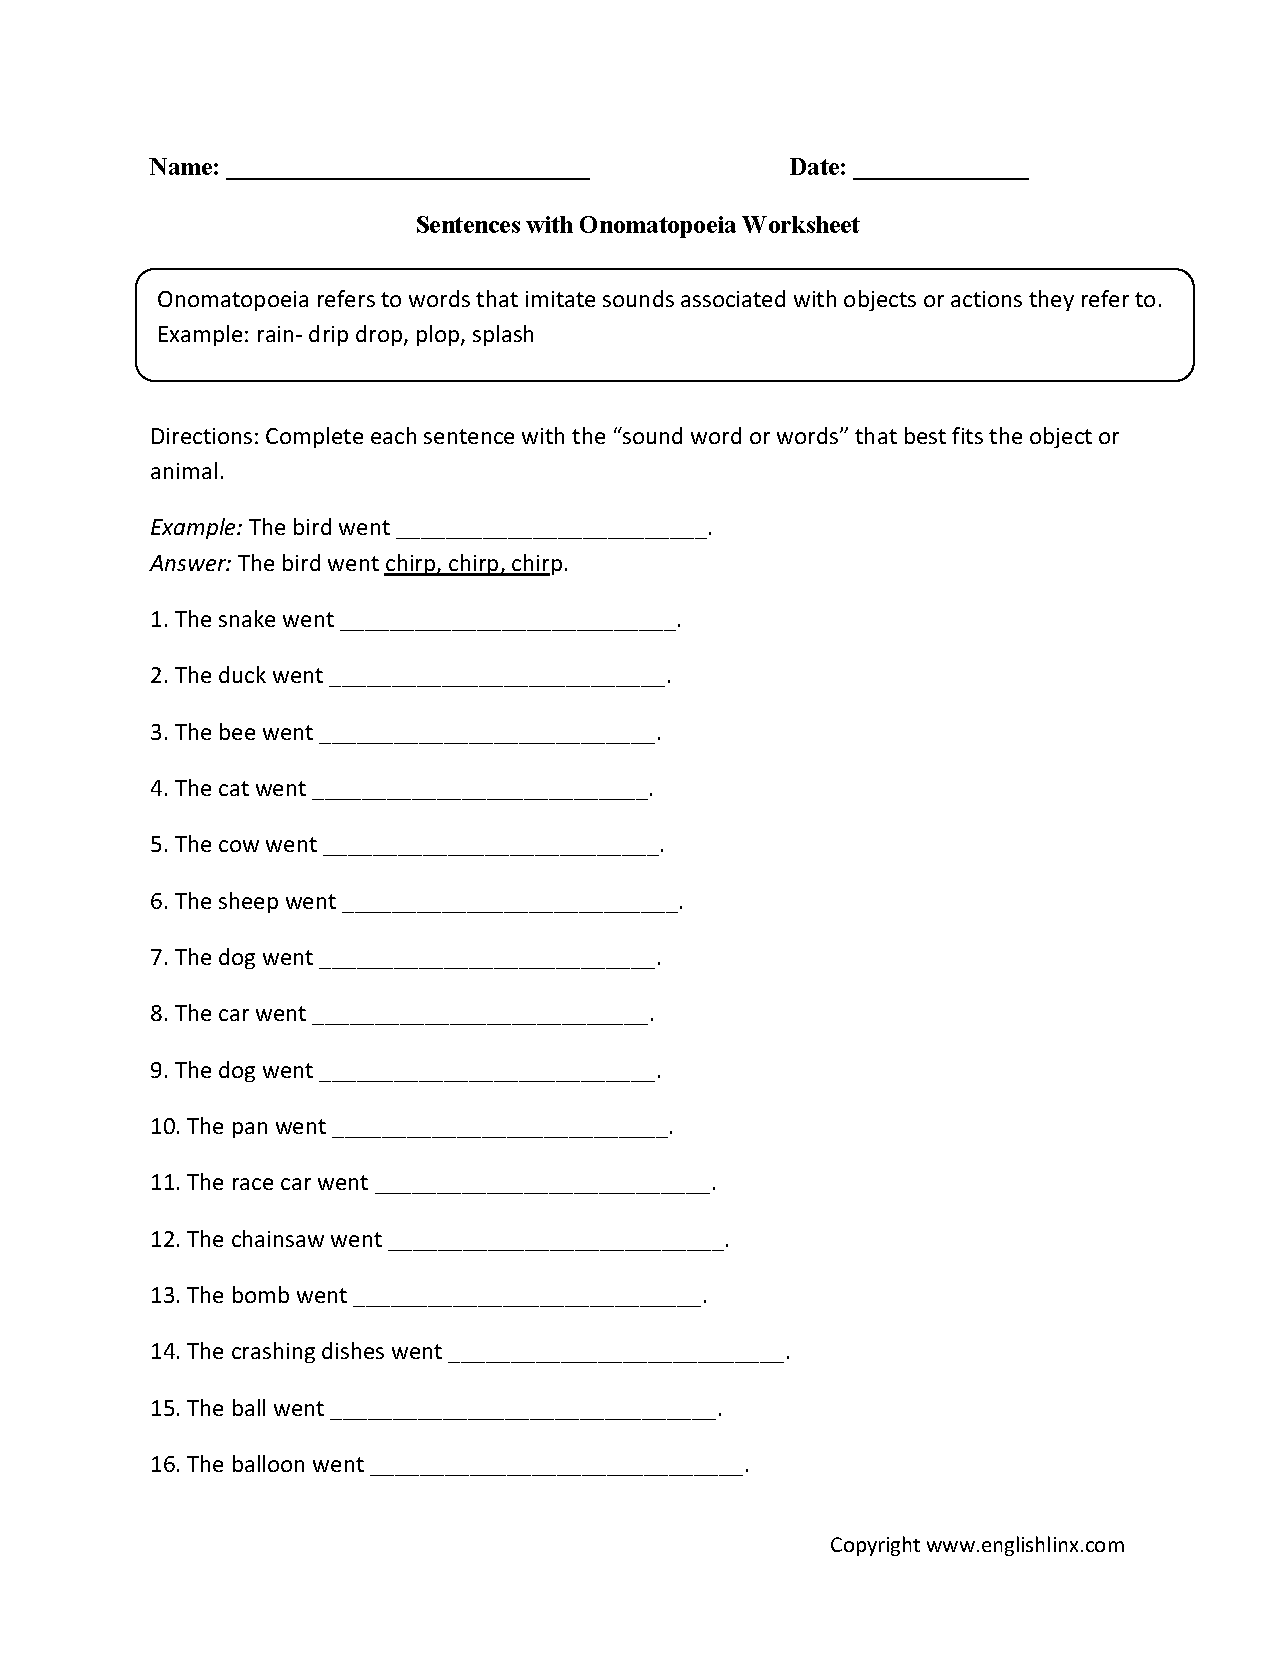 Worksheets Onomatopoeia Worksheet sentences with onomatopoeia worksheet nfcs pinterest worksheet